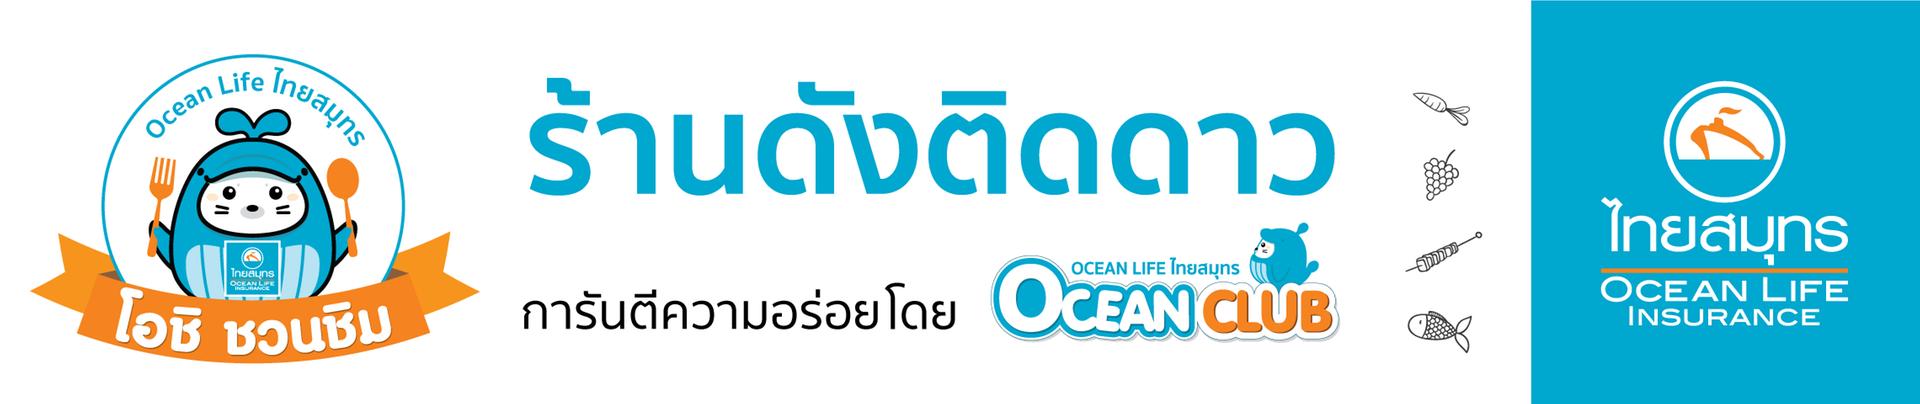 Ocean Life Insurance